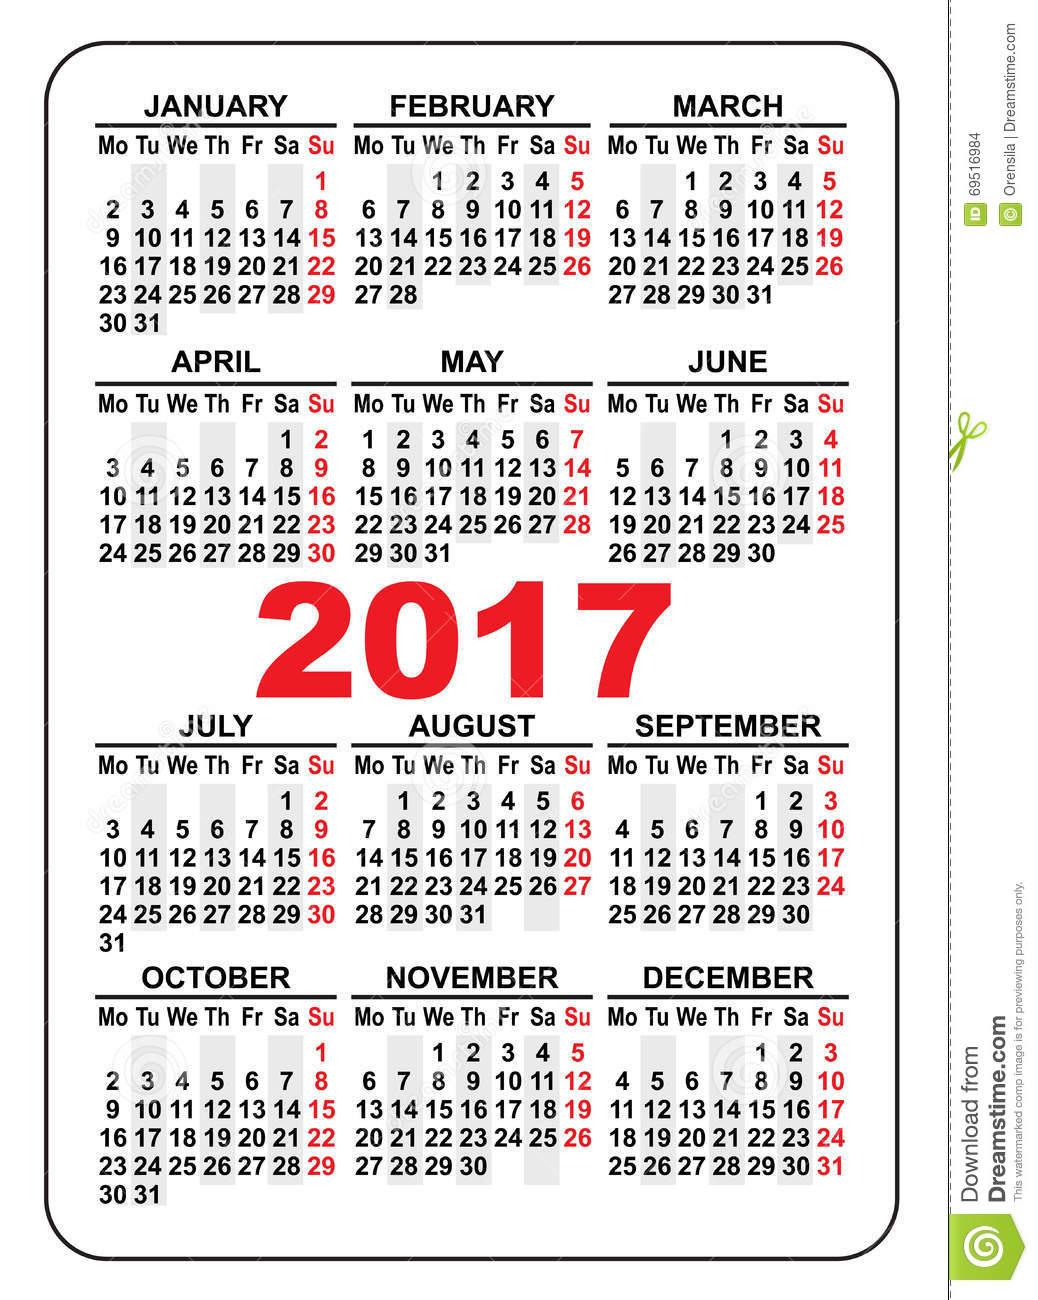 2017 Pocket Calendar | Templates Free Printable throughout Free Printable Pocket Calendar